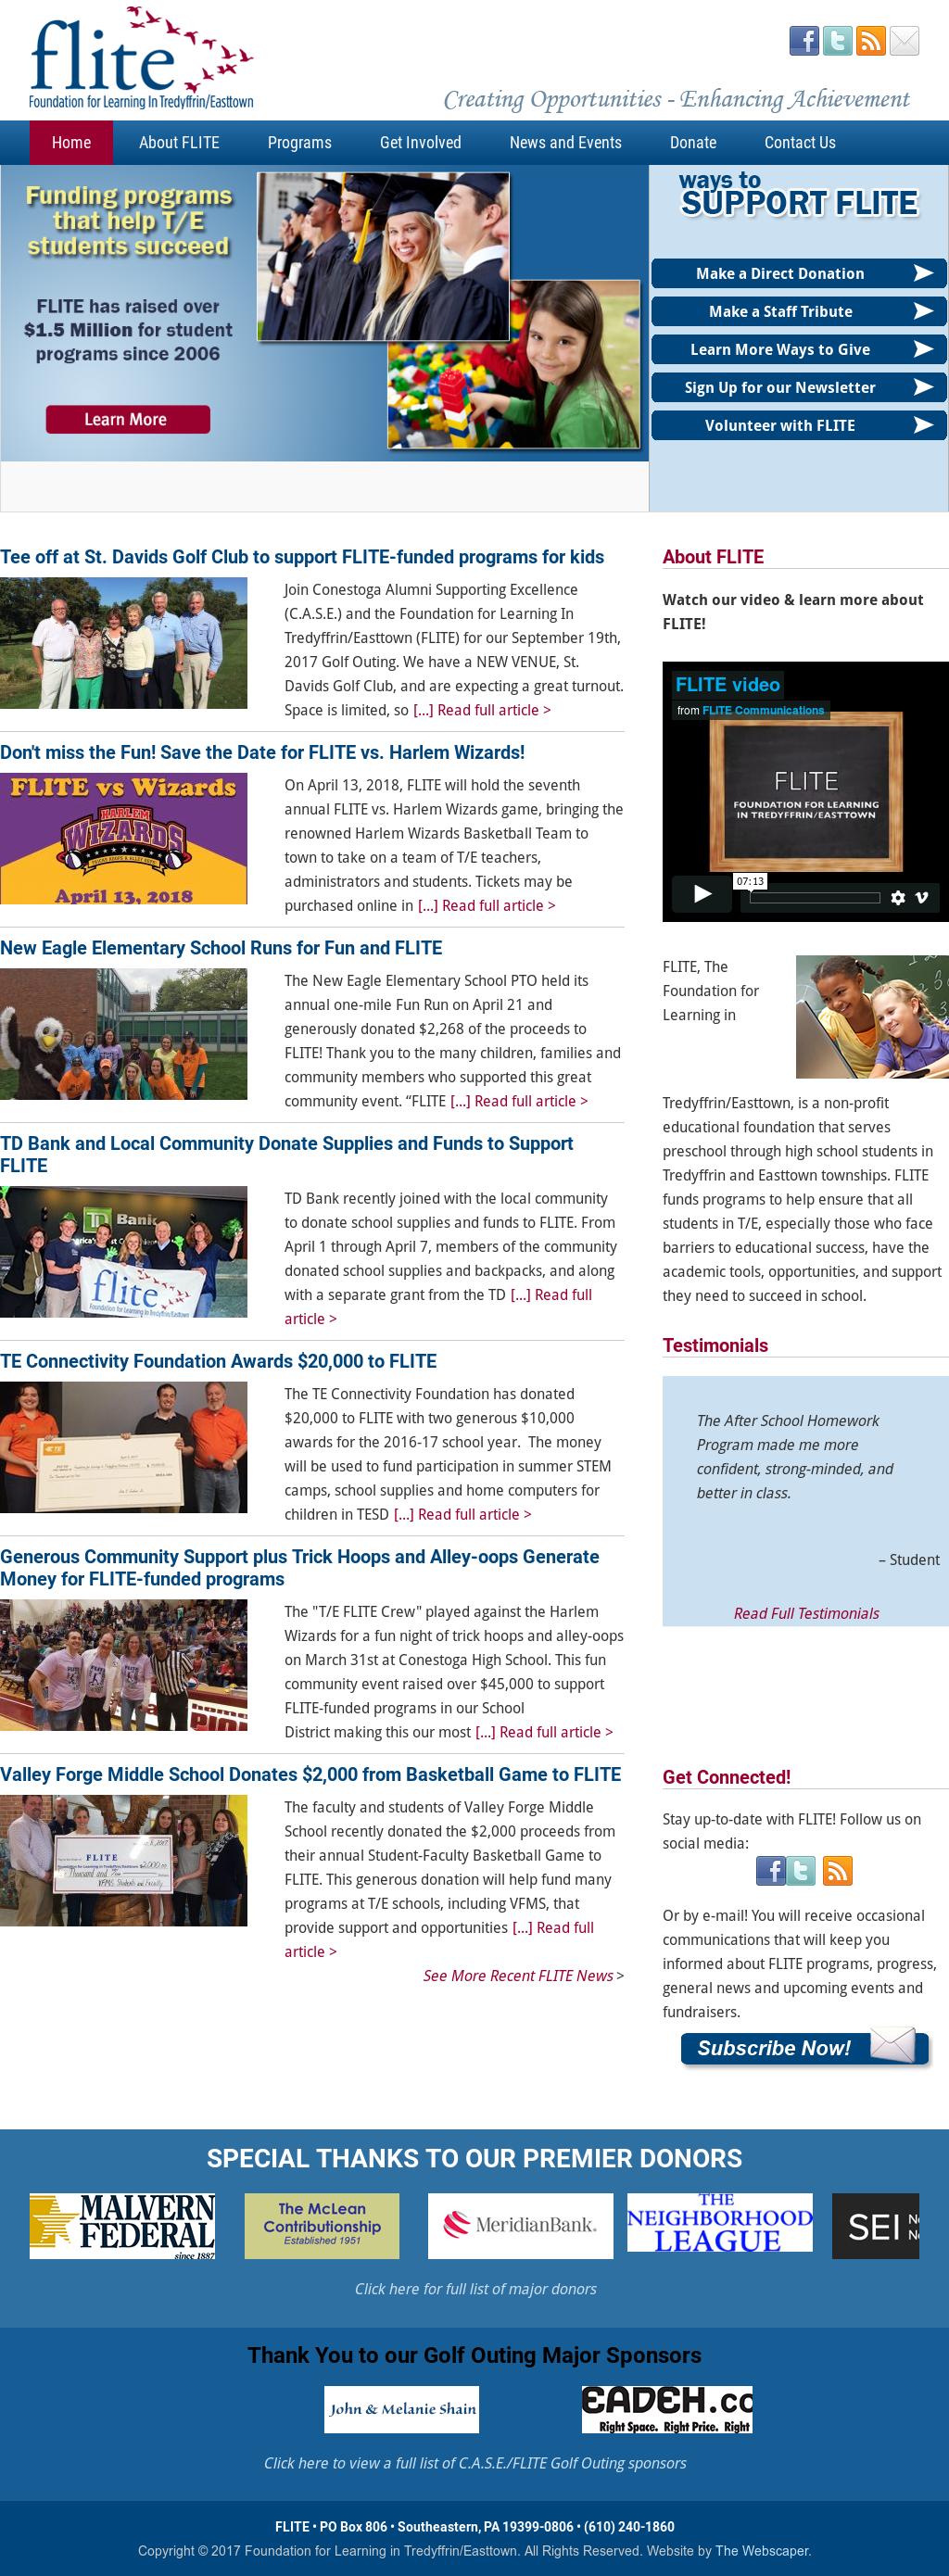 Flite: Foundation For Learning In Tredyffrin/easttown